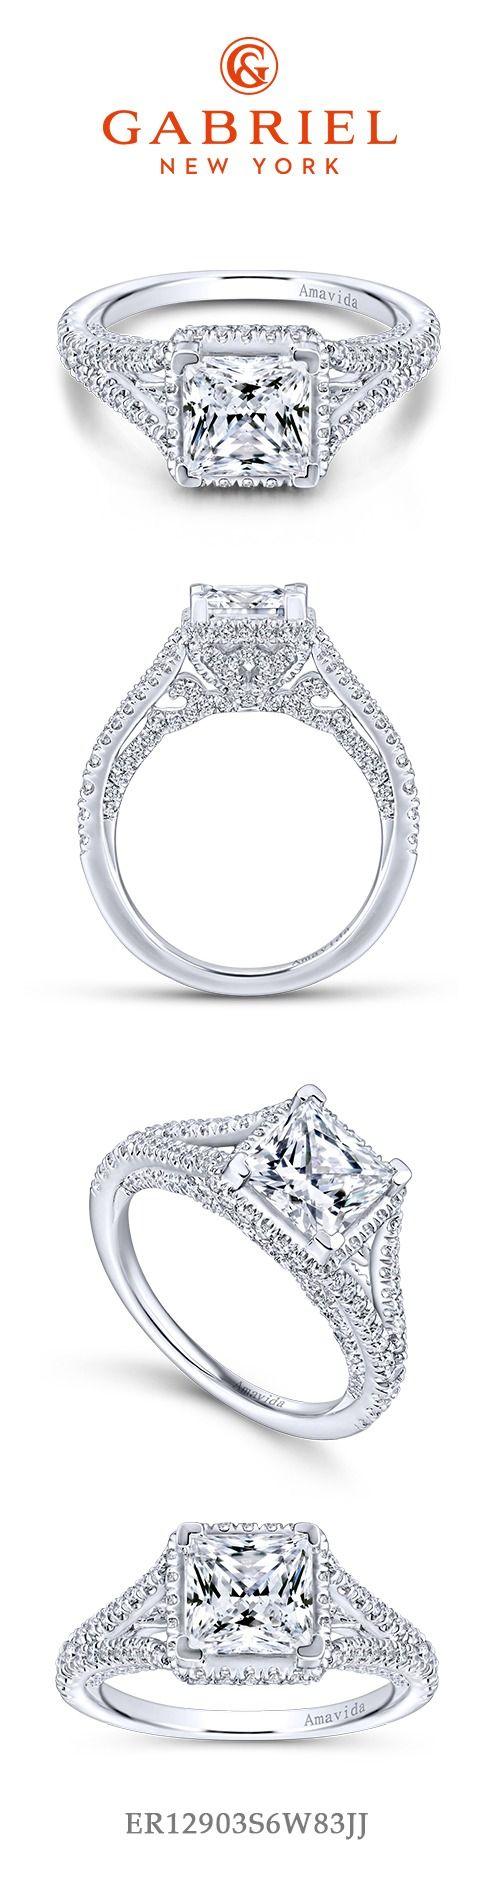 25+ Best Ideas About Diamond Rings On Pinterest  Round Cut Diamond Rings,  Diamonds And Princess Wedding Rings